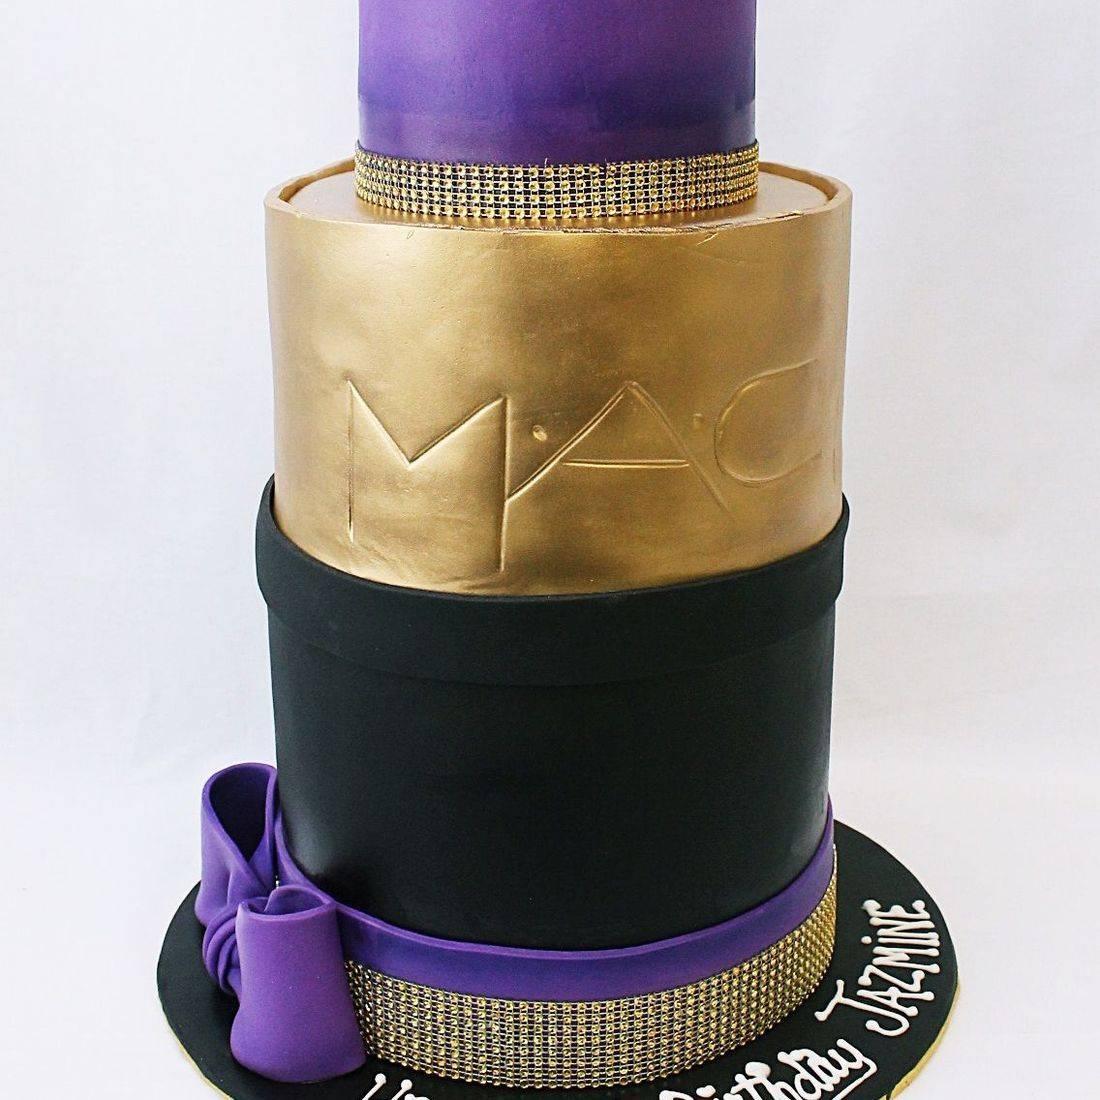 Giant MAC Lipstick Cake Carved Dimensional Cake Milwaukee